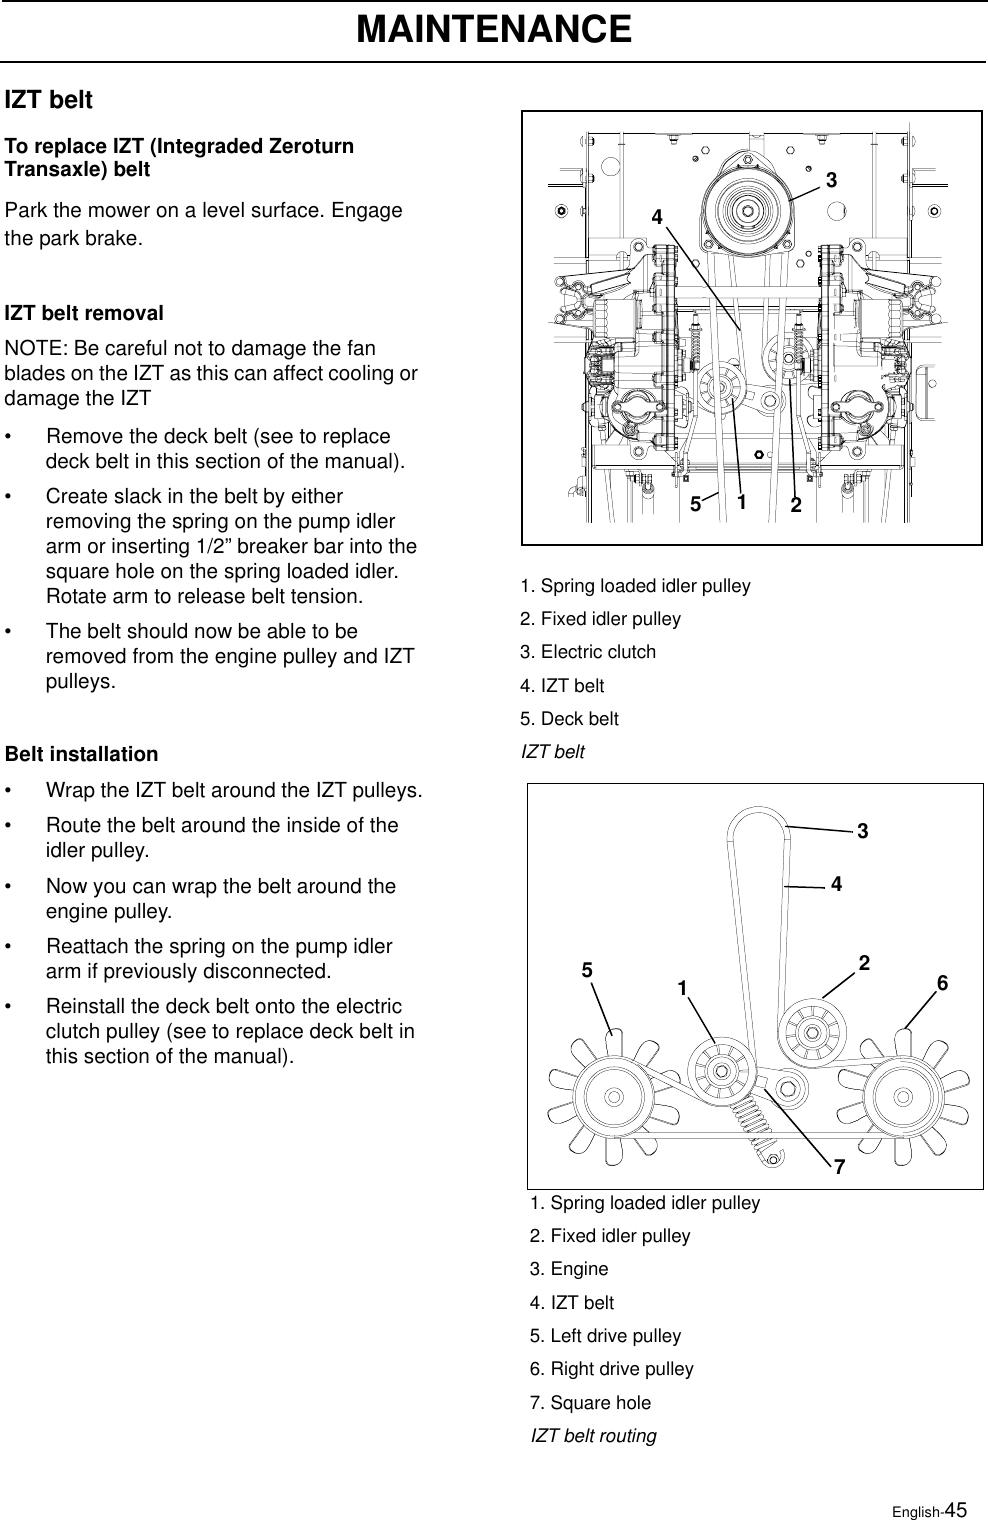 Yazoo Kees Zekw42170 Zekw52210 Users Manual OM, Esteem